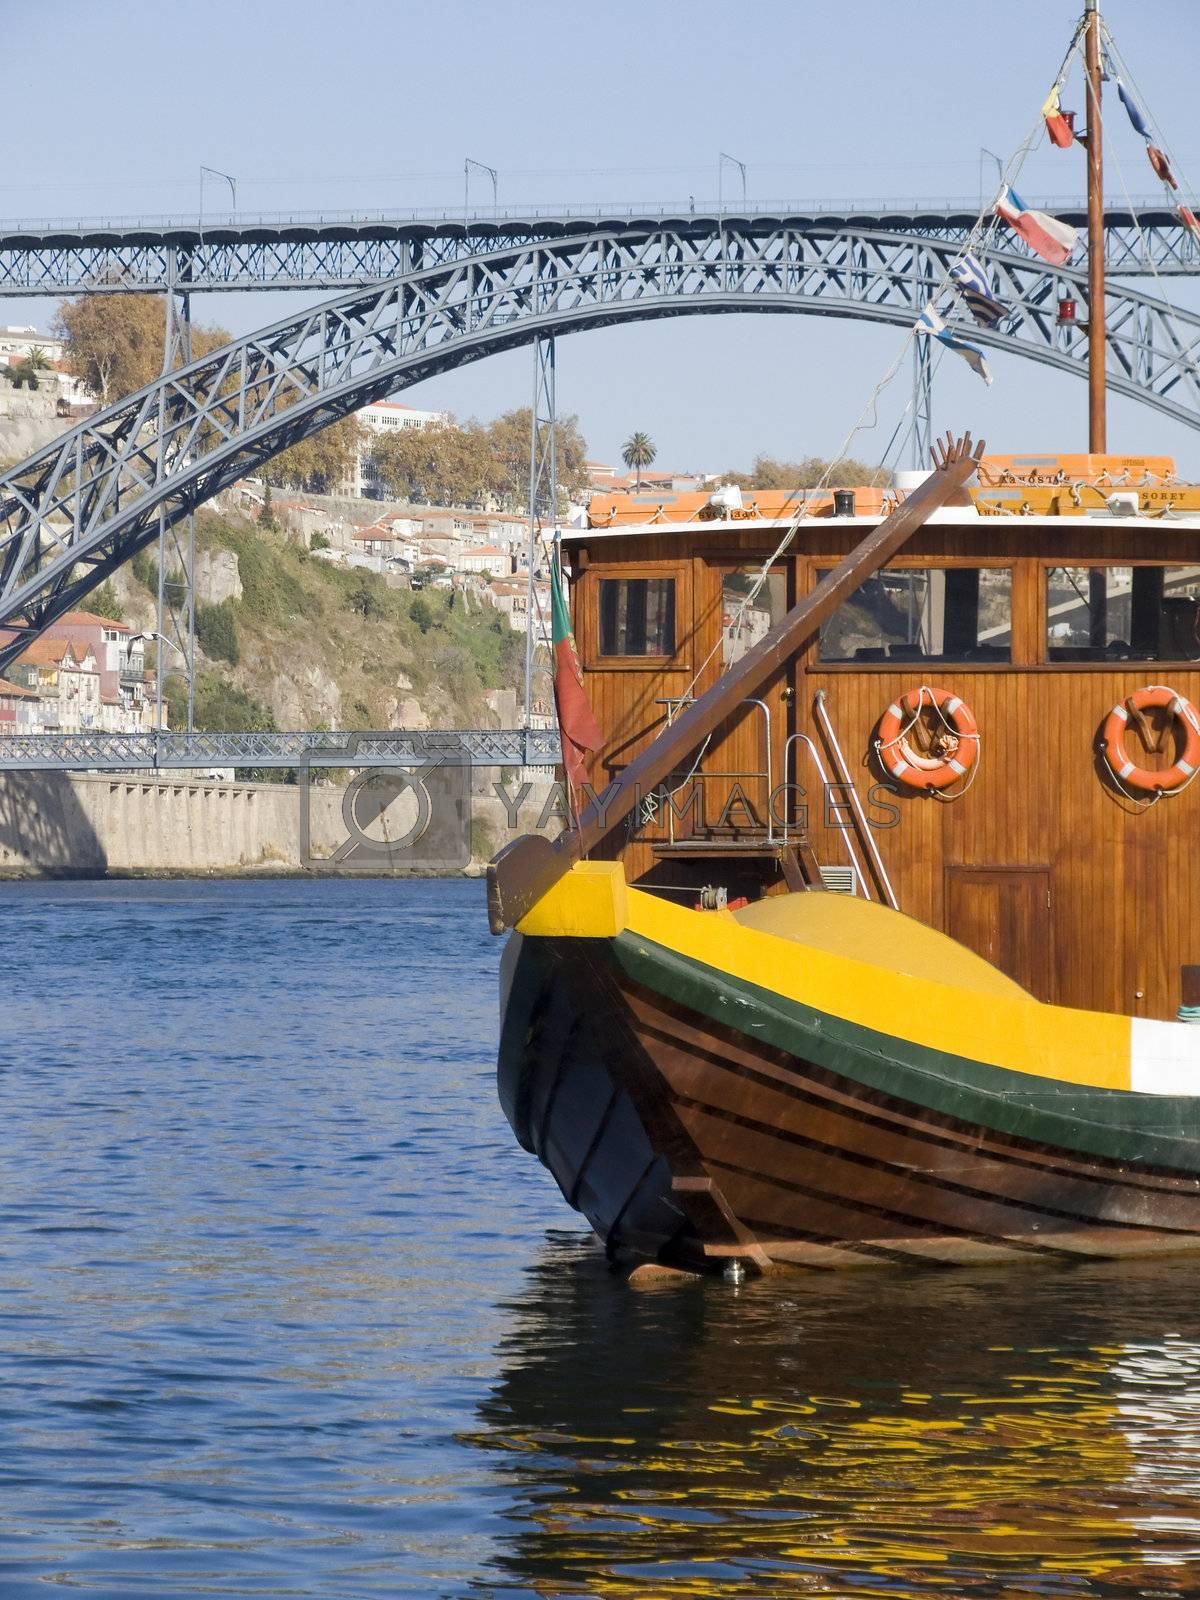 Tradicional boat at Porto by PauloResende